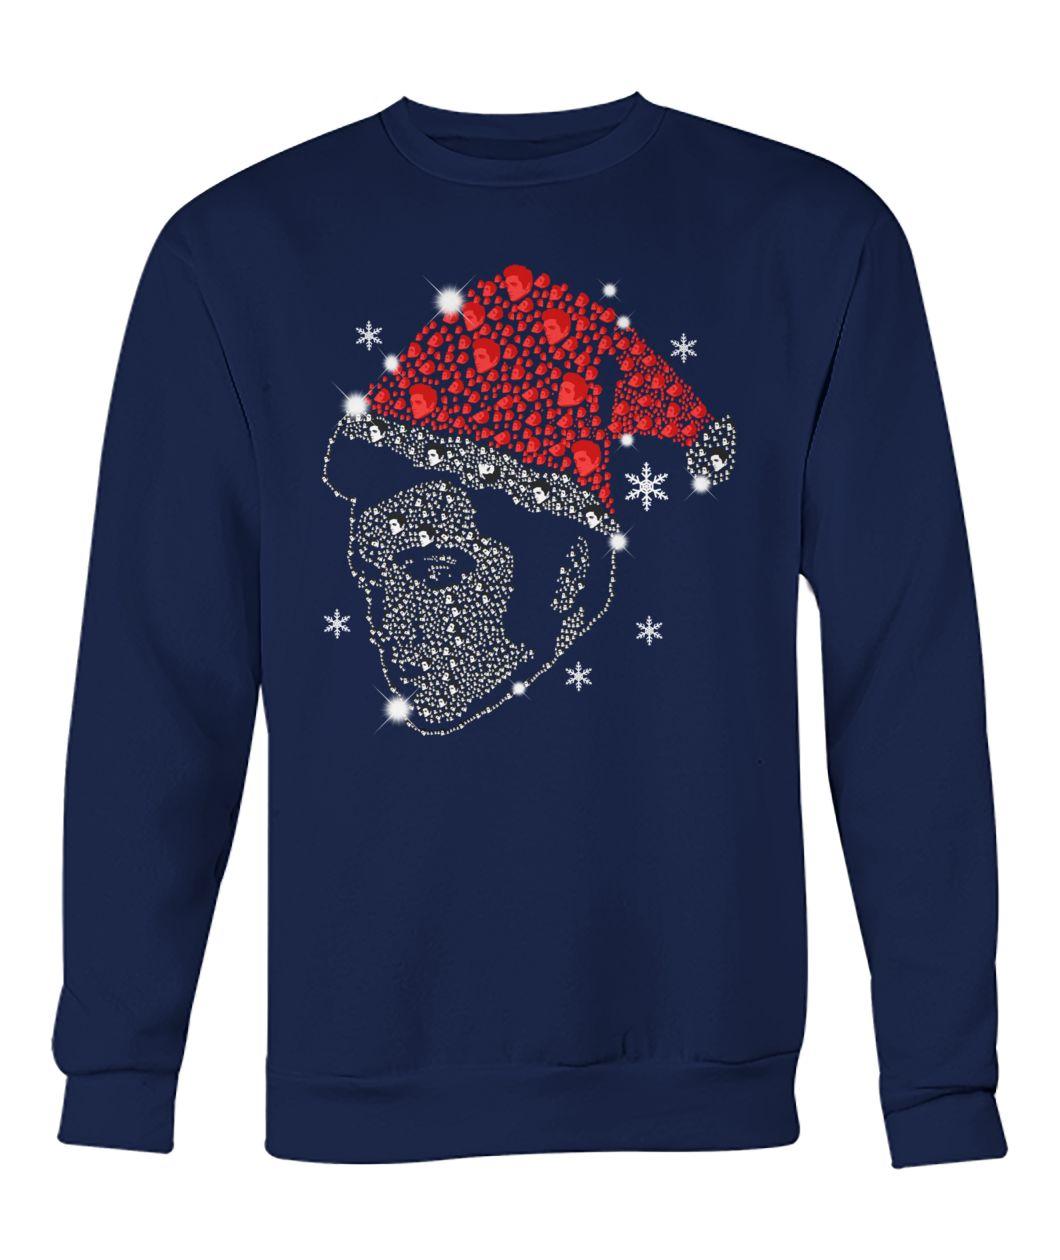 Rhinestone Christmas Elvis Presley sweatshirt